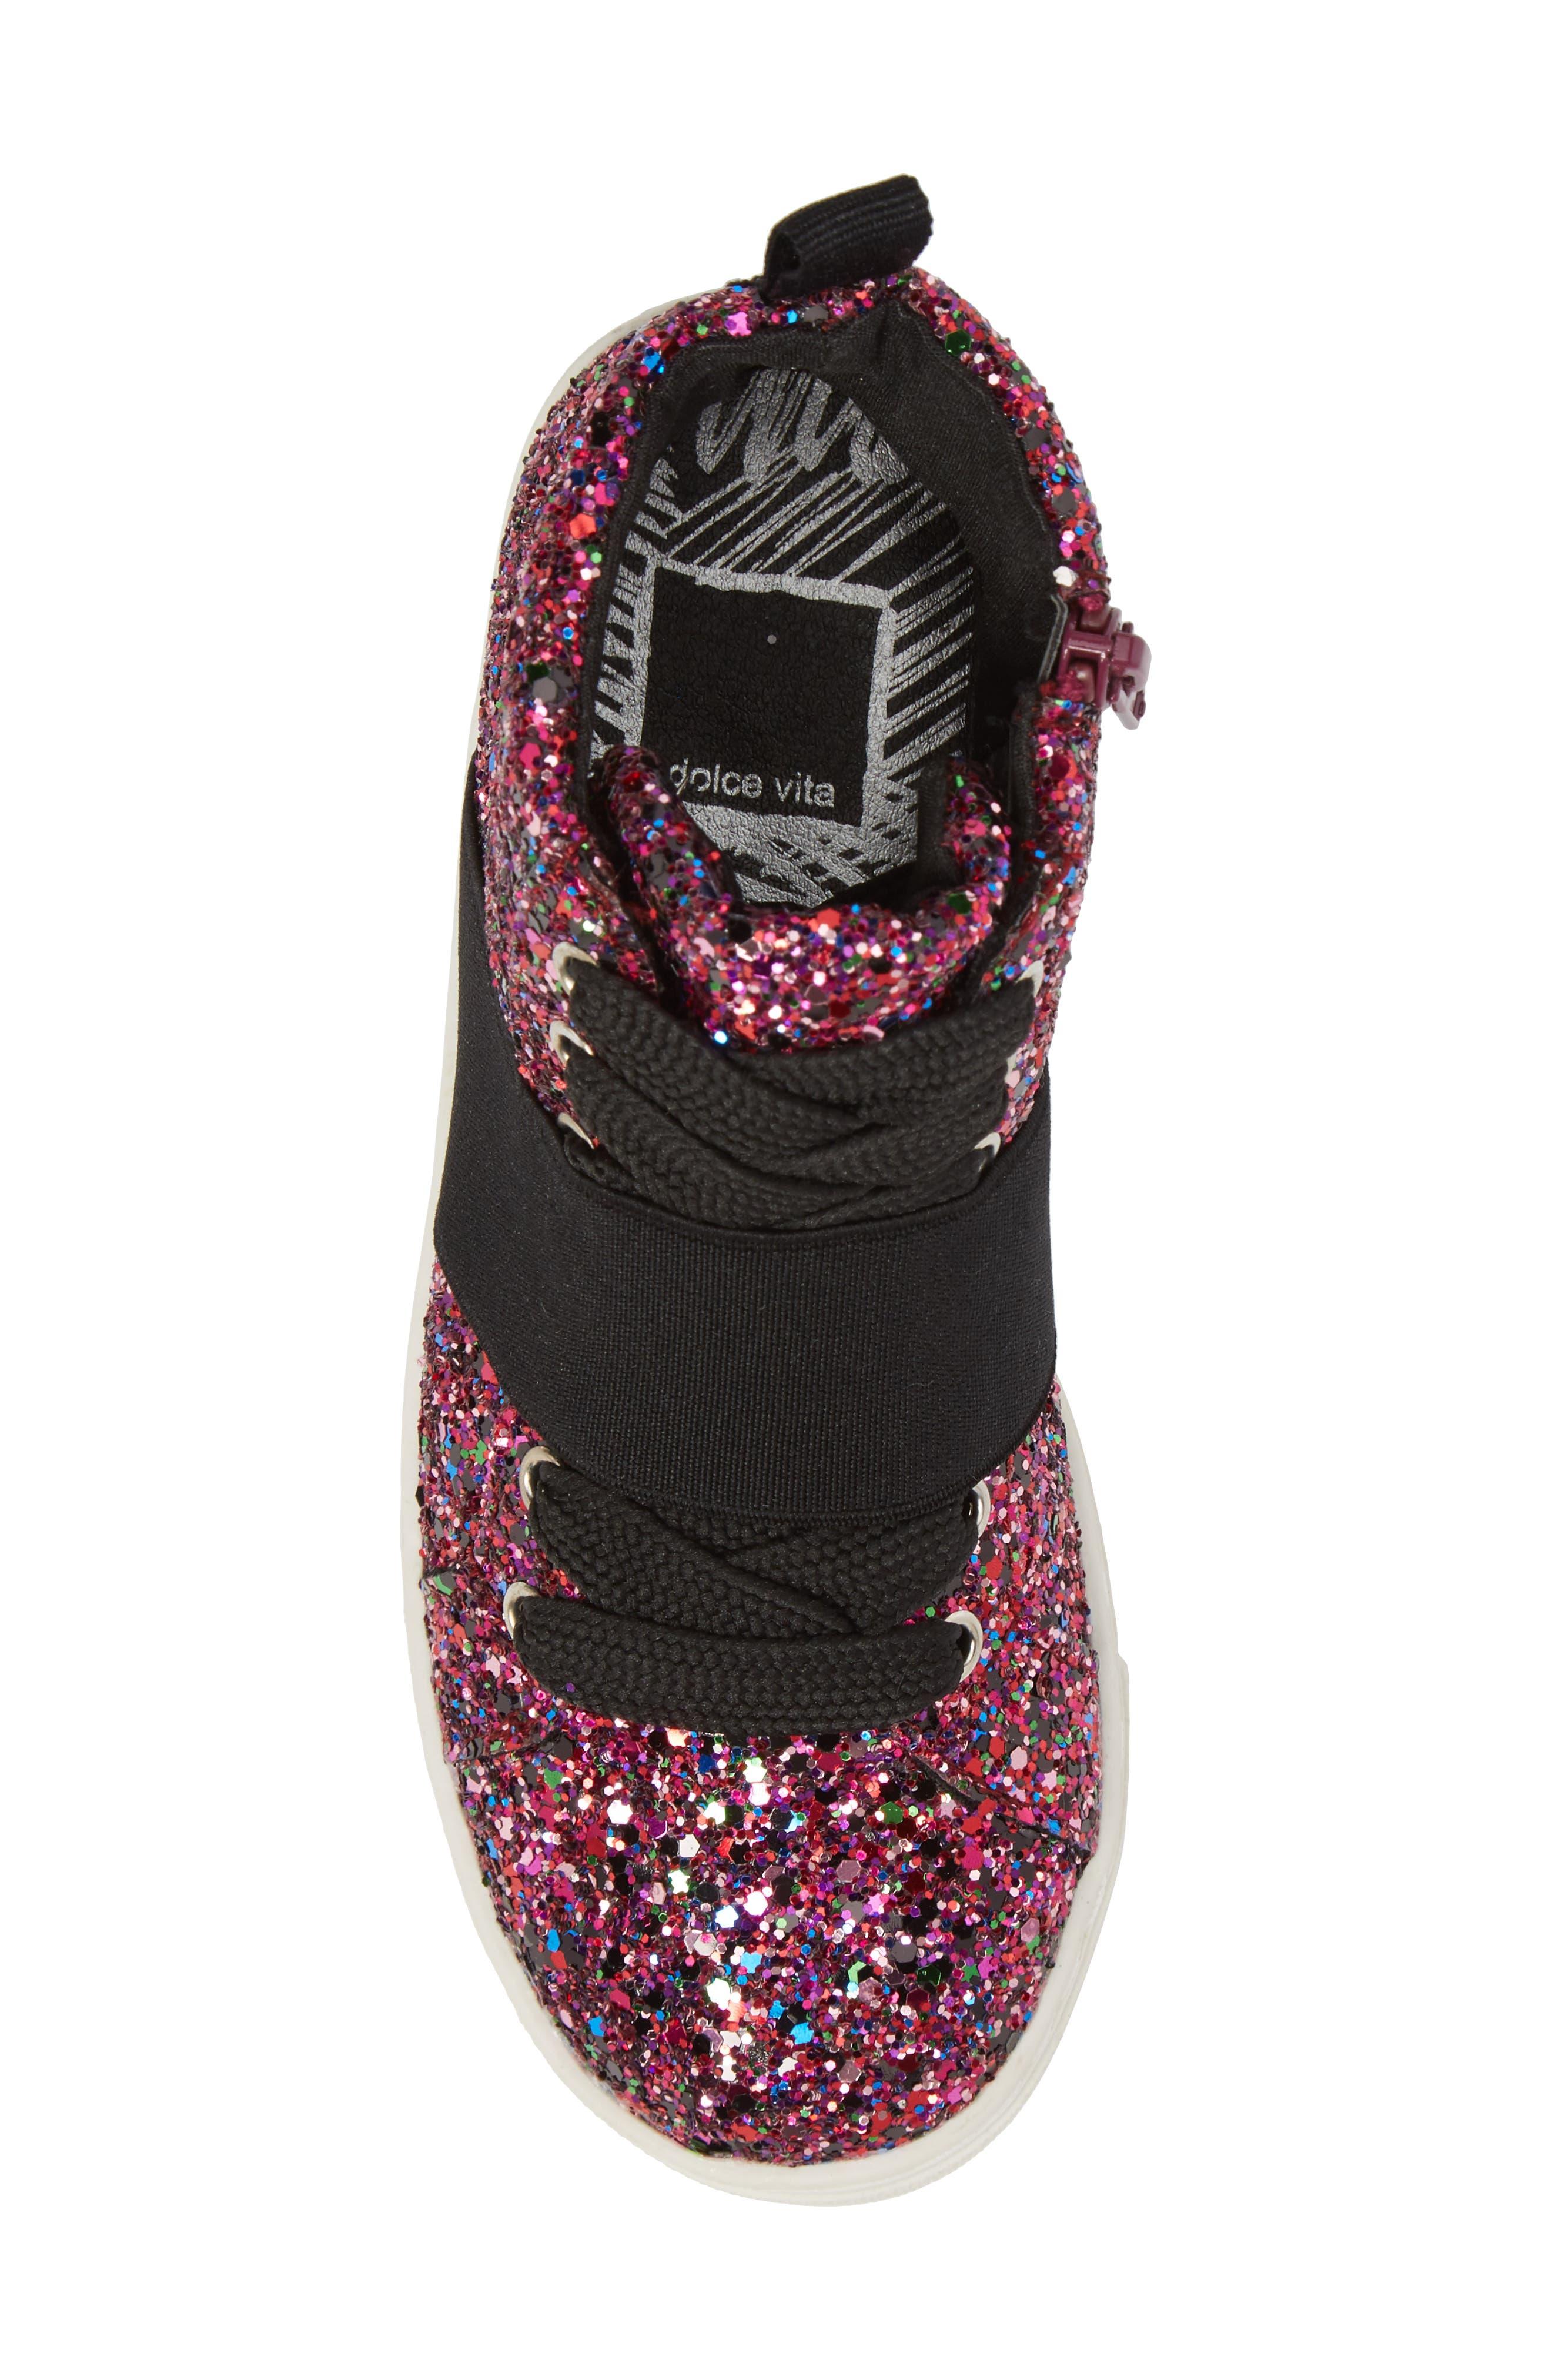 Zoa High Top Sneaker,                             Alternate thumbnail 5, color,                             Fuchsia Glitter